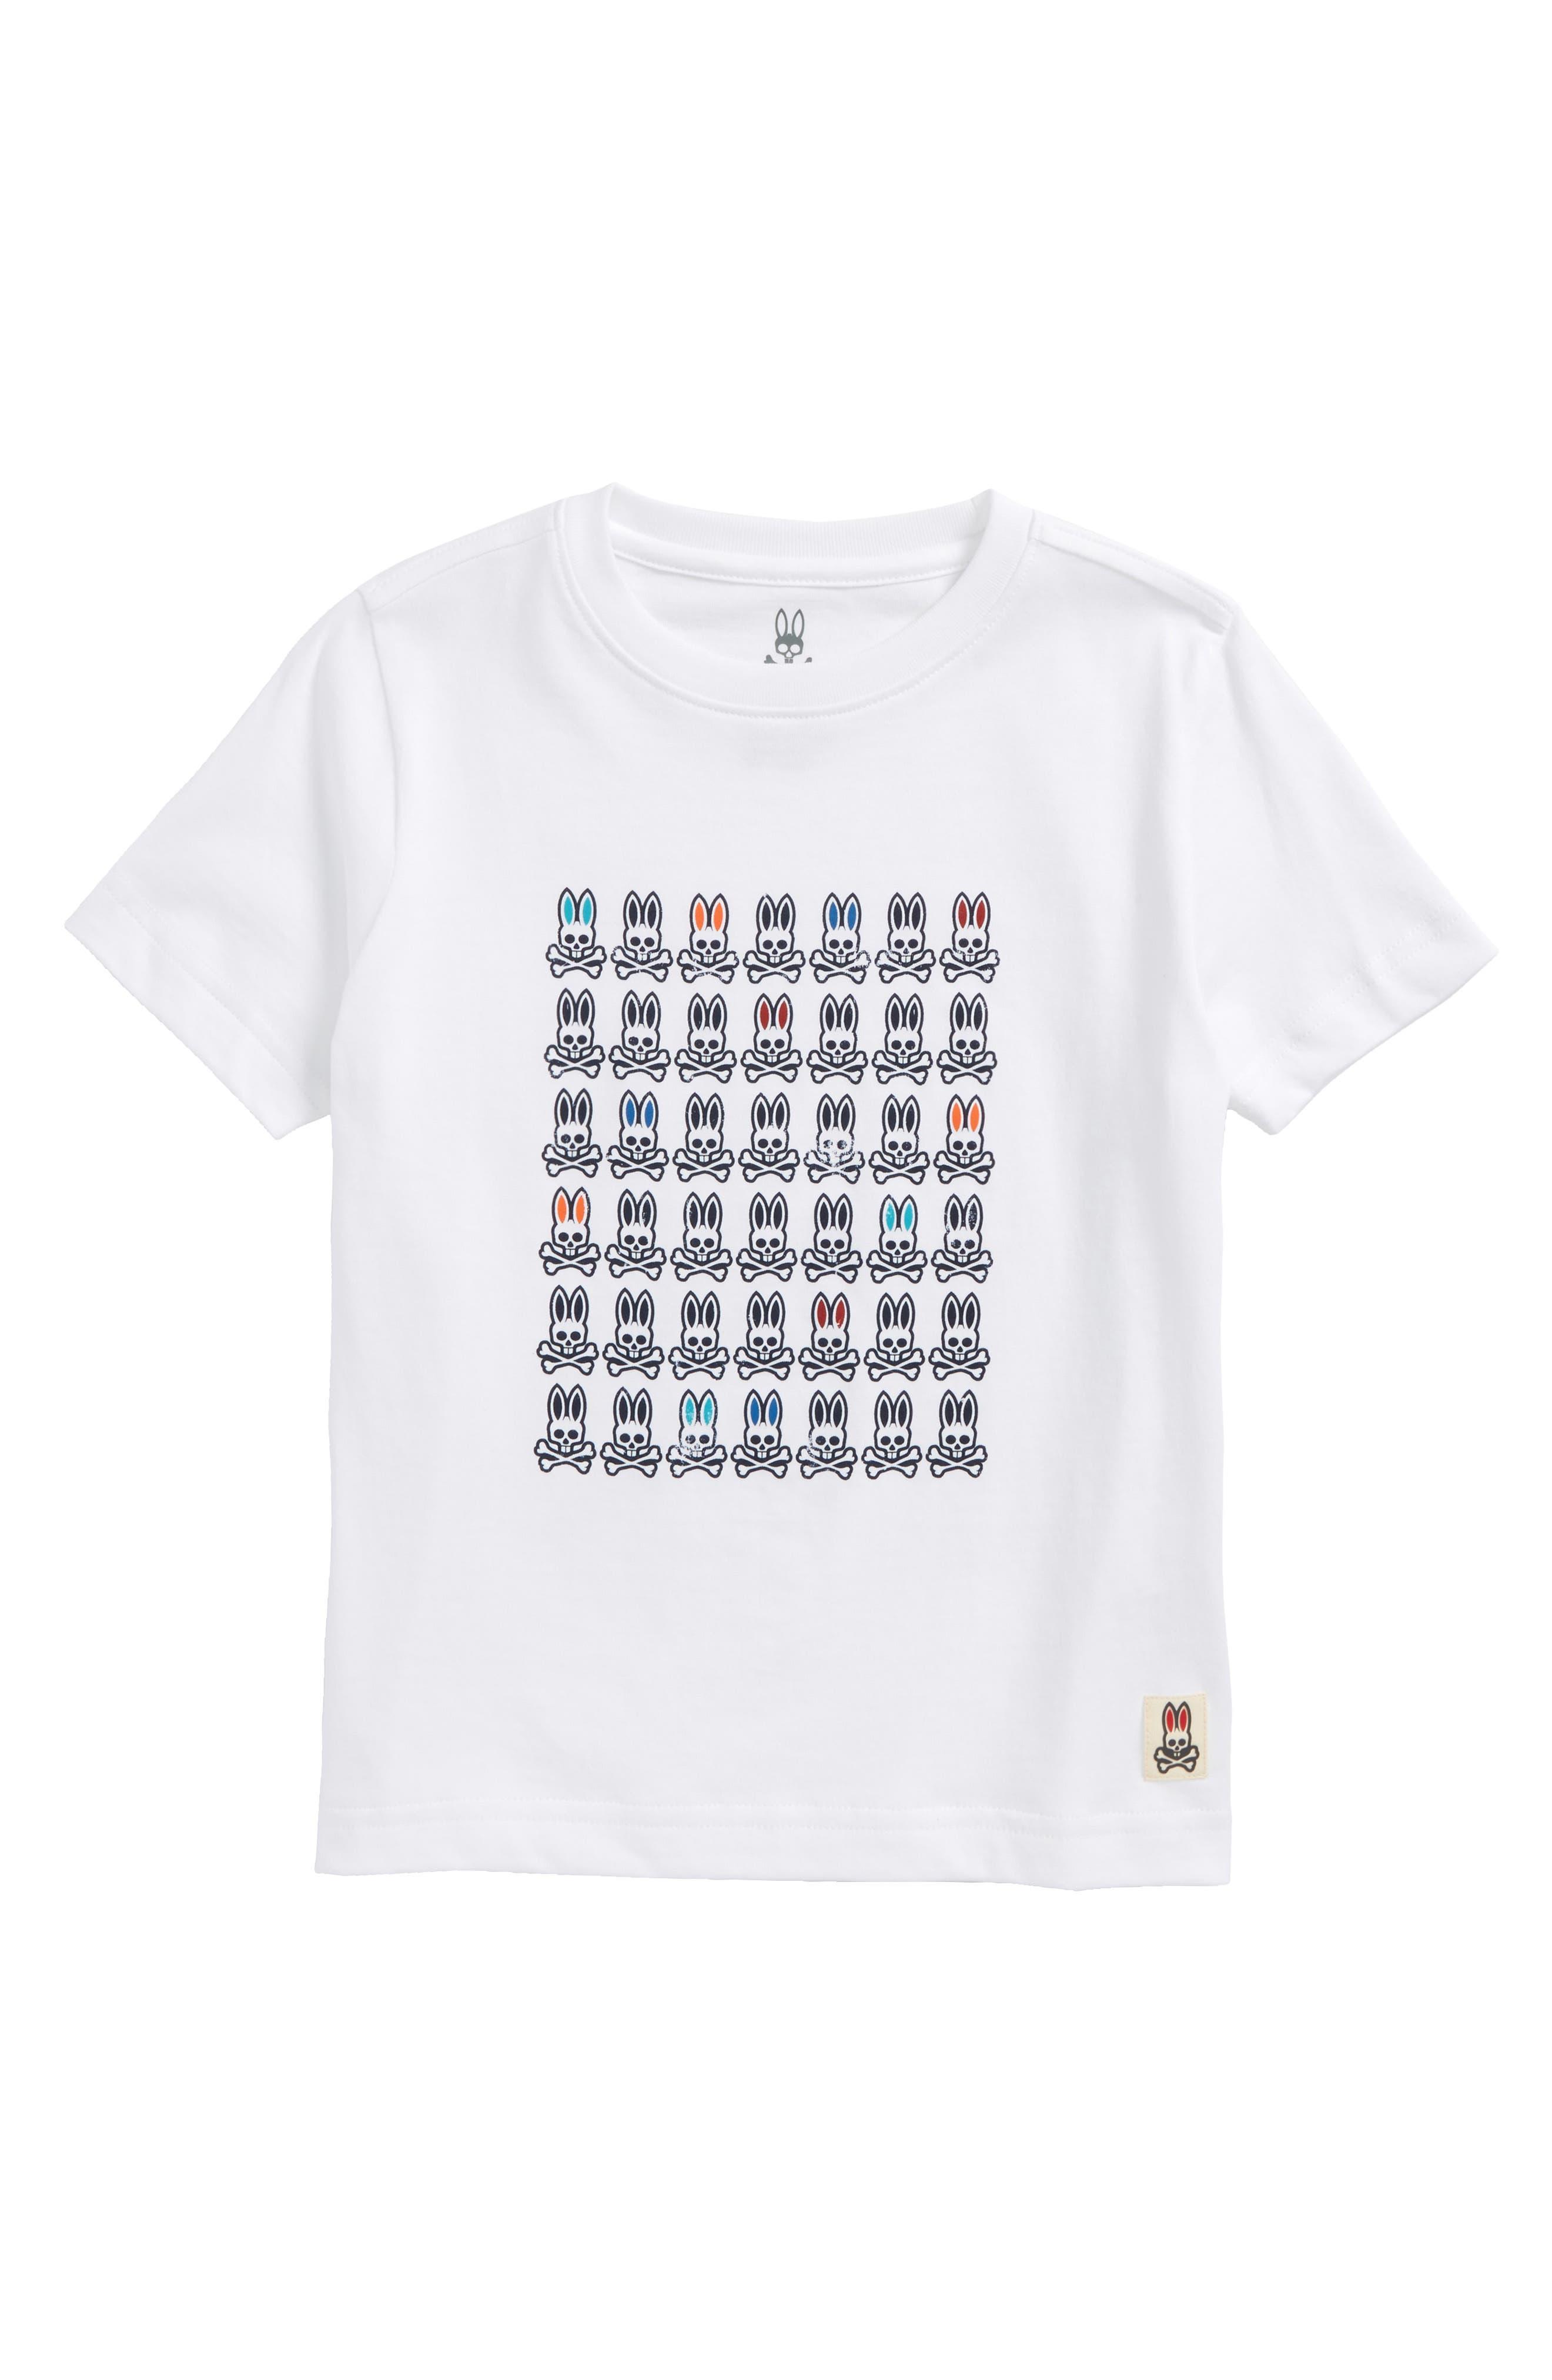 Alternate Image 1 Selected - Psycho Bunny Logo Graphic T-Shirt (Little Boys & Big Boys)